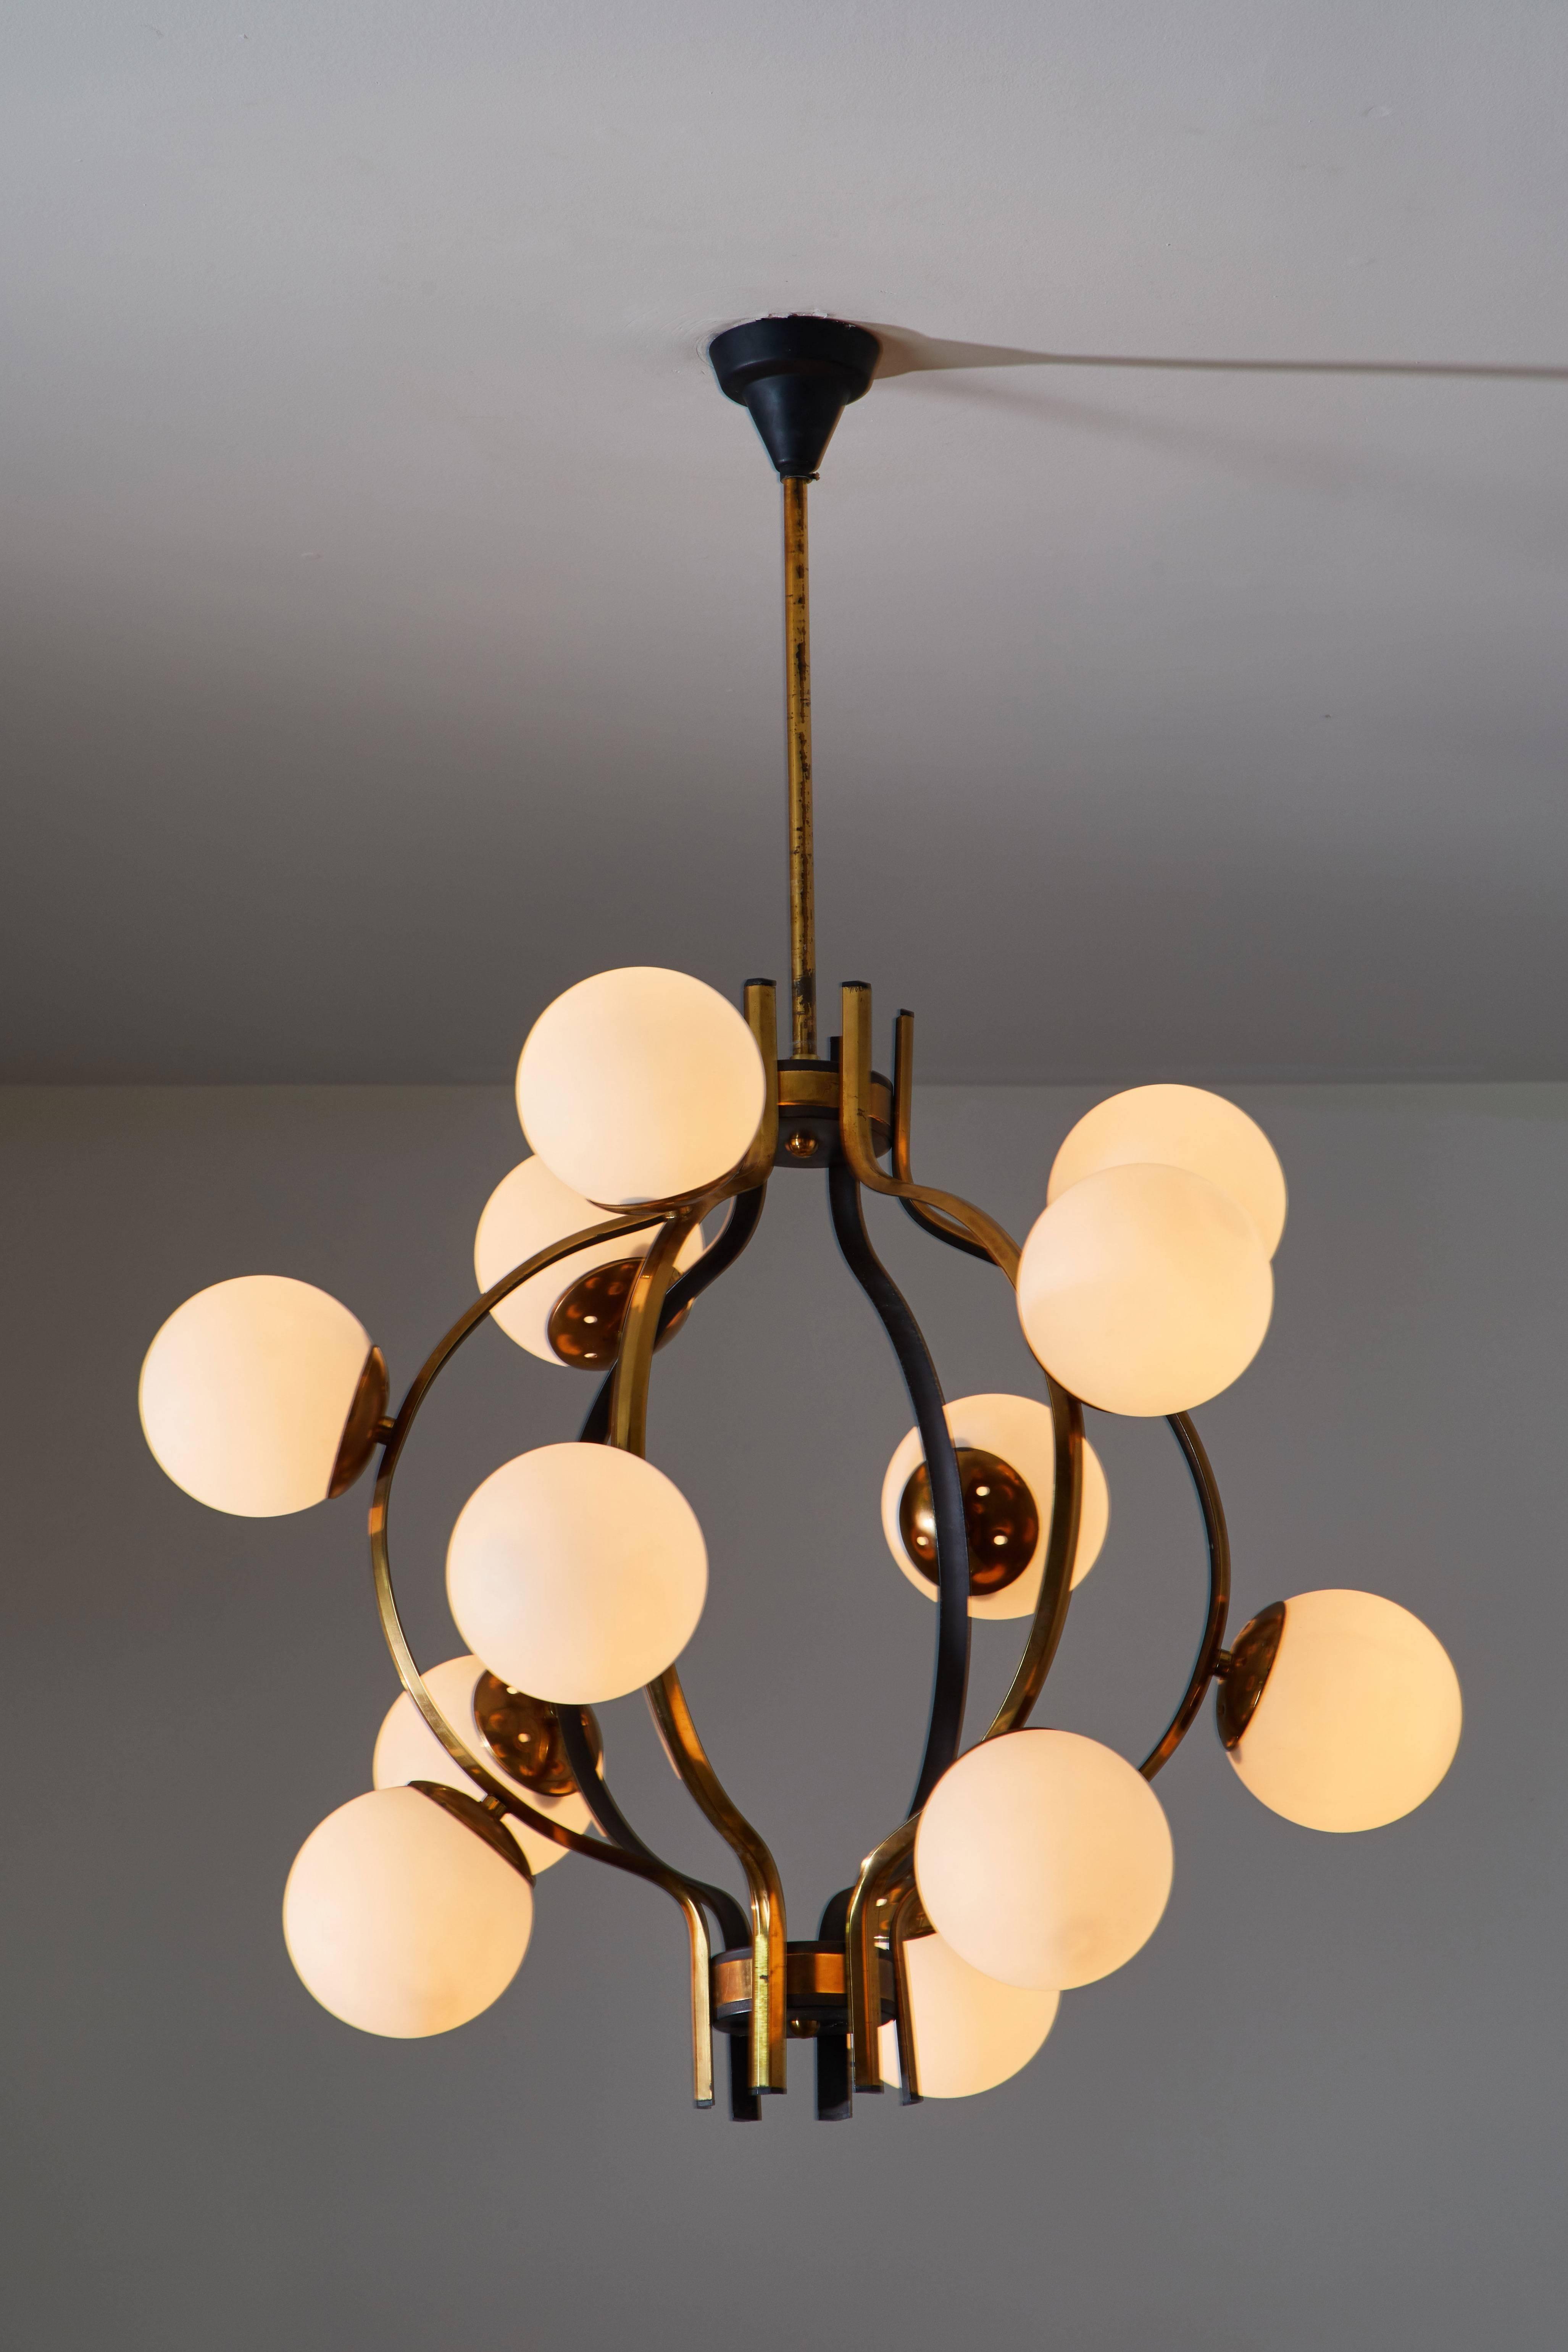 Twelve globe chandelier by stilnovo for sale at 1stdibs arubaitofo Gallery